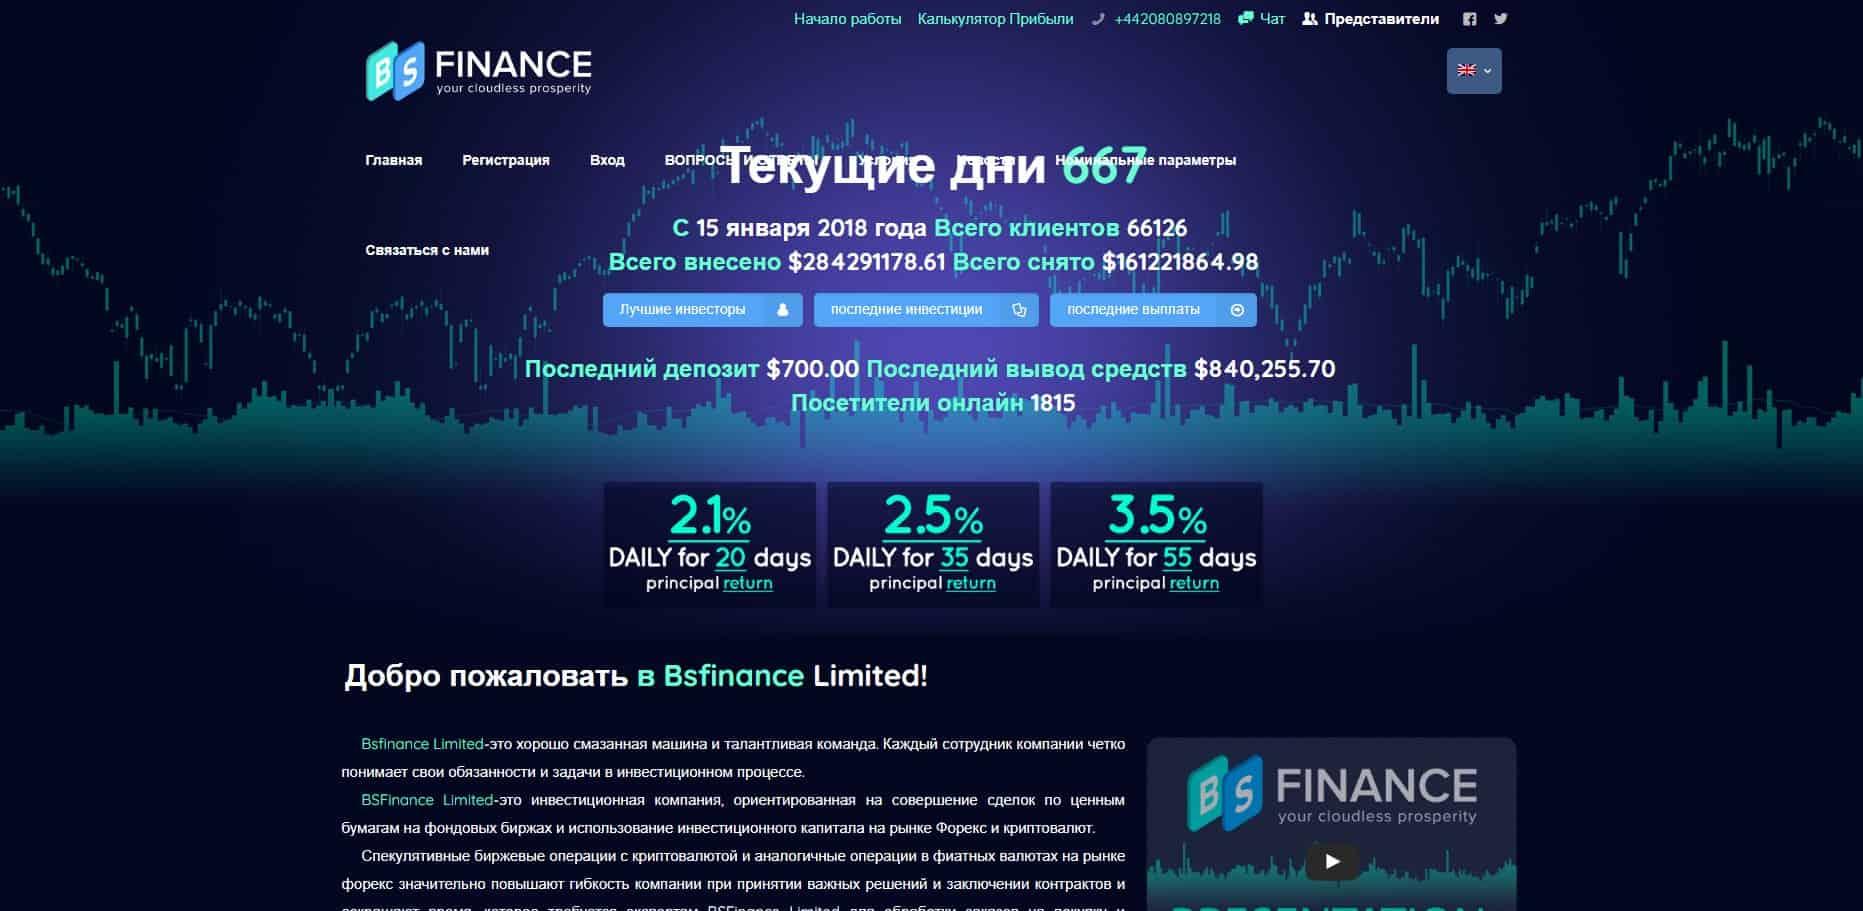 BSFinance Limited